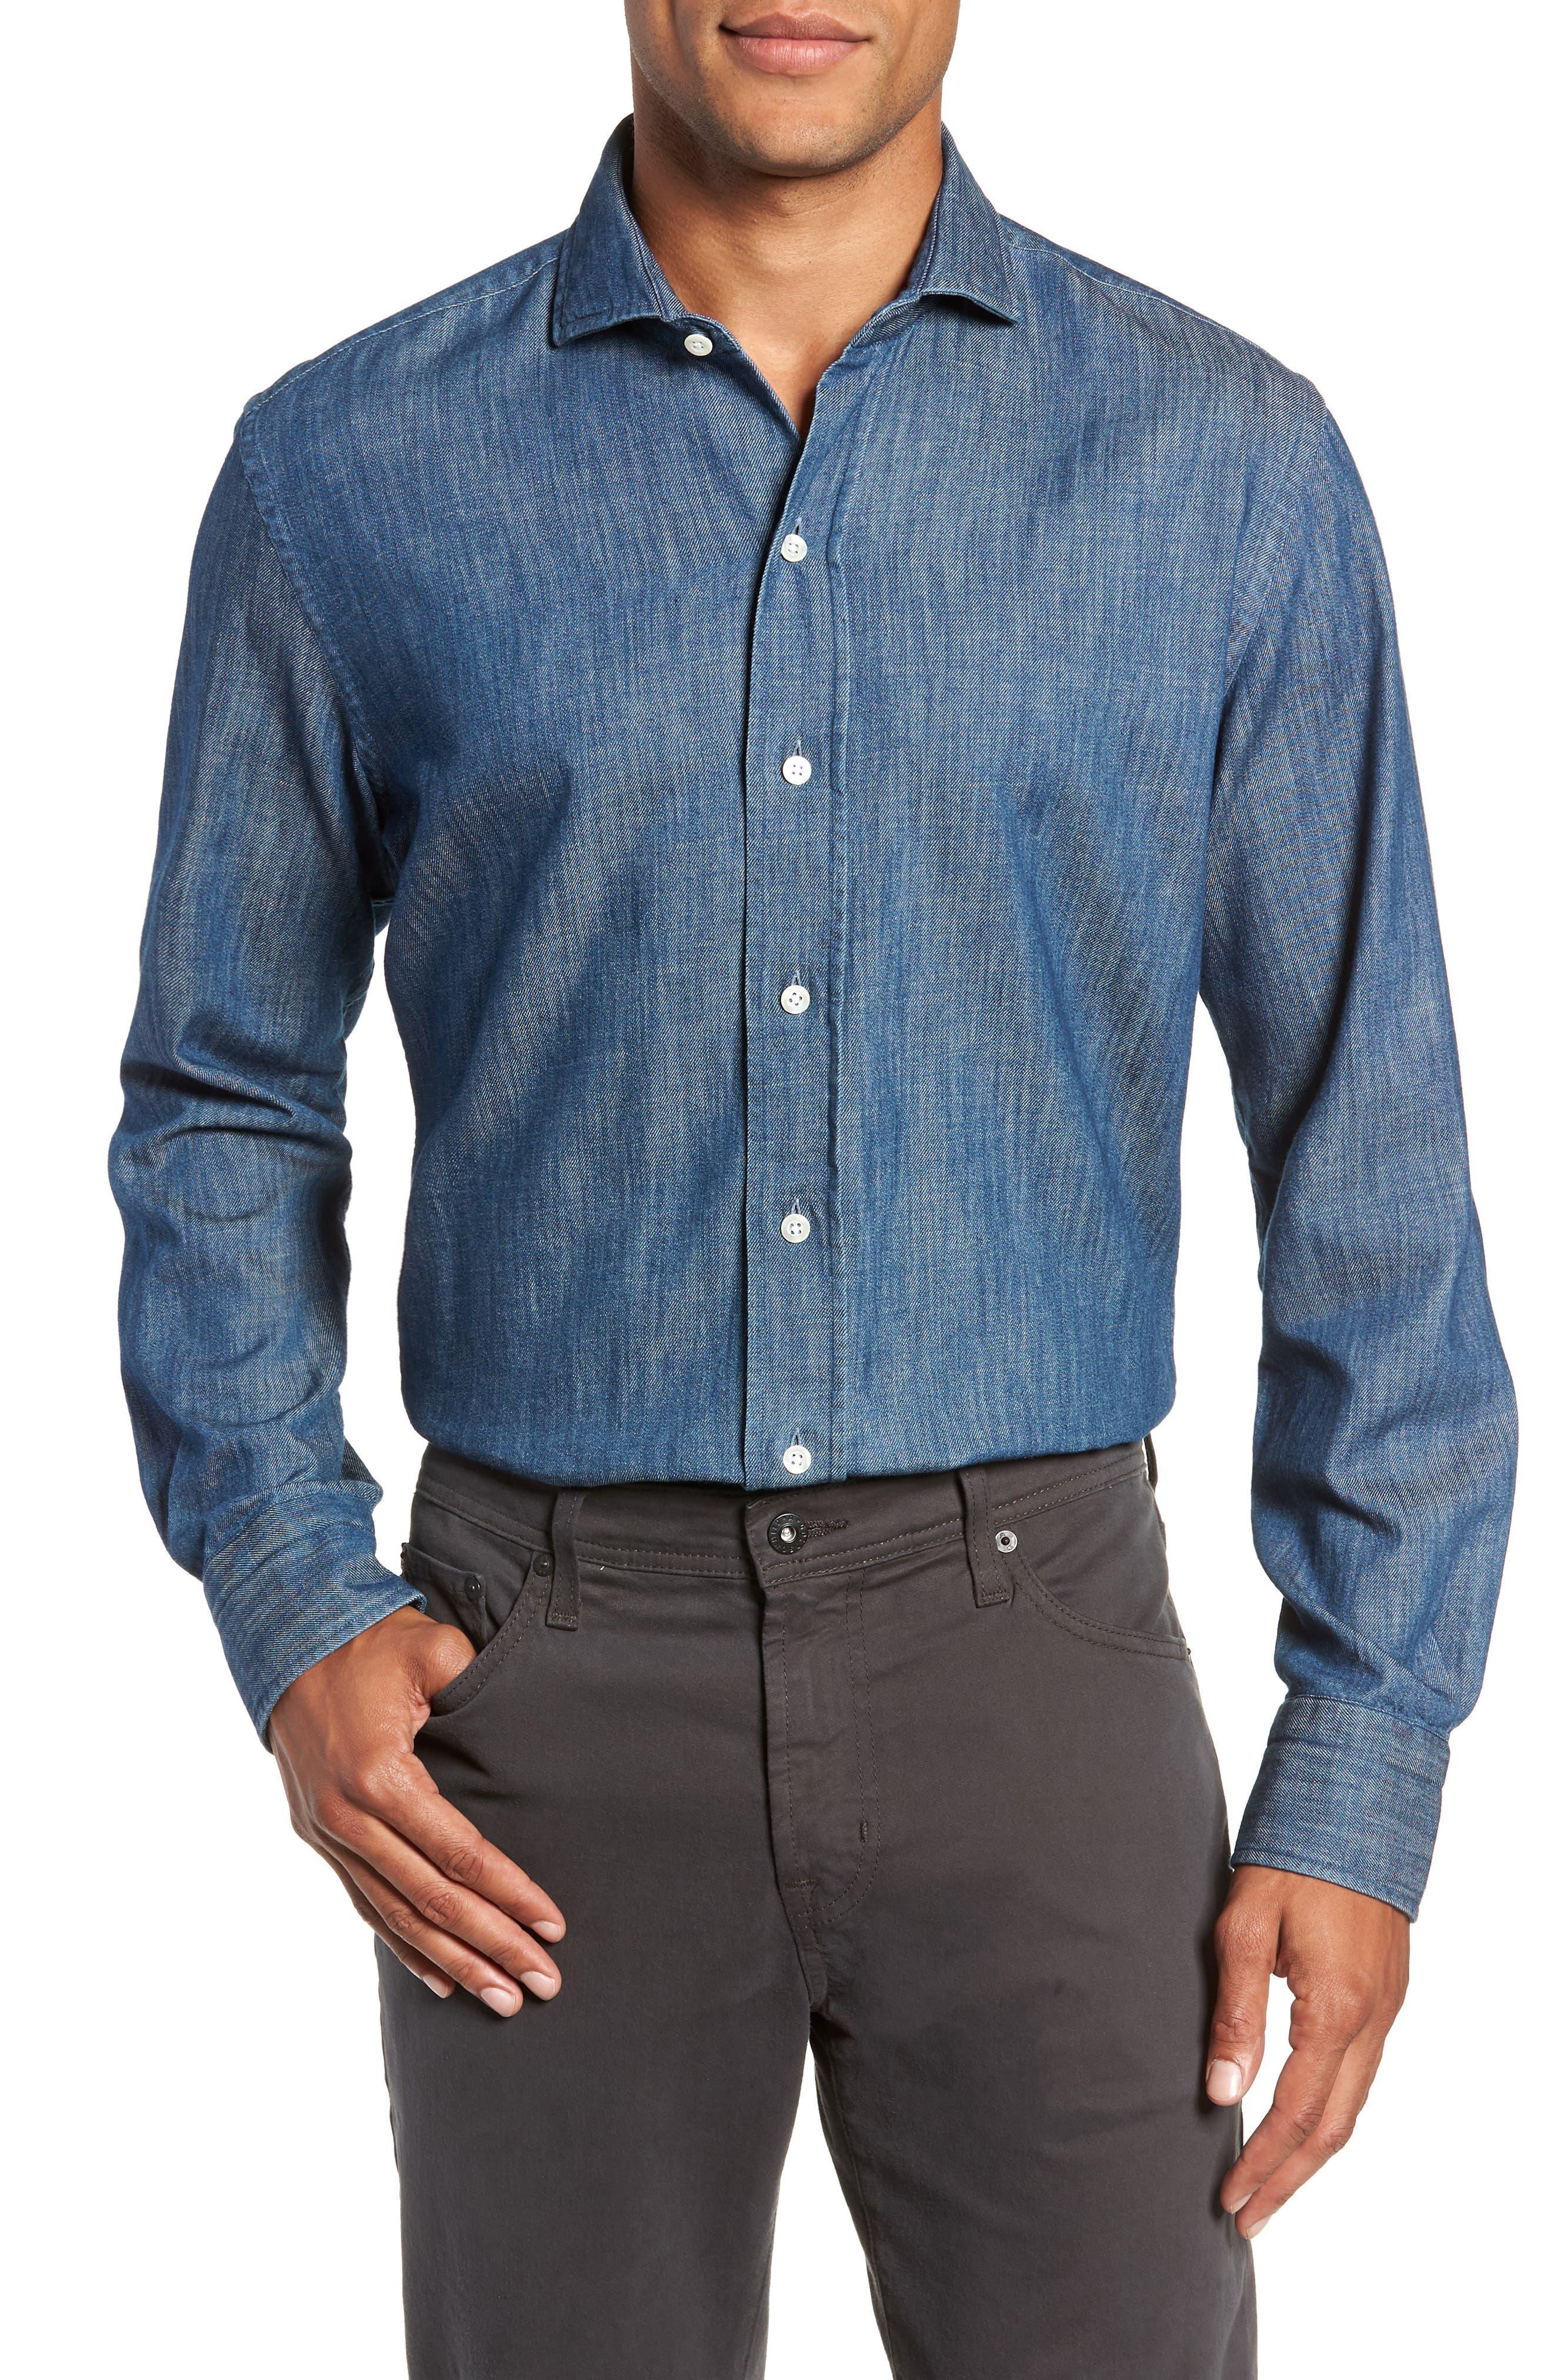 LEDBURY Greydon Trim Fit Denim Dress Shirt in Blue